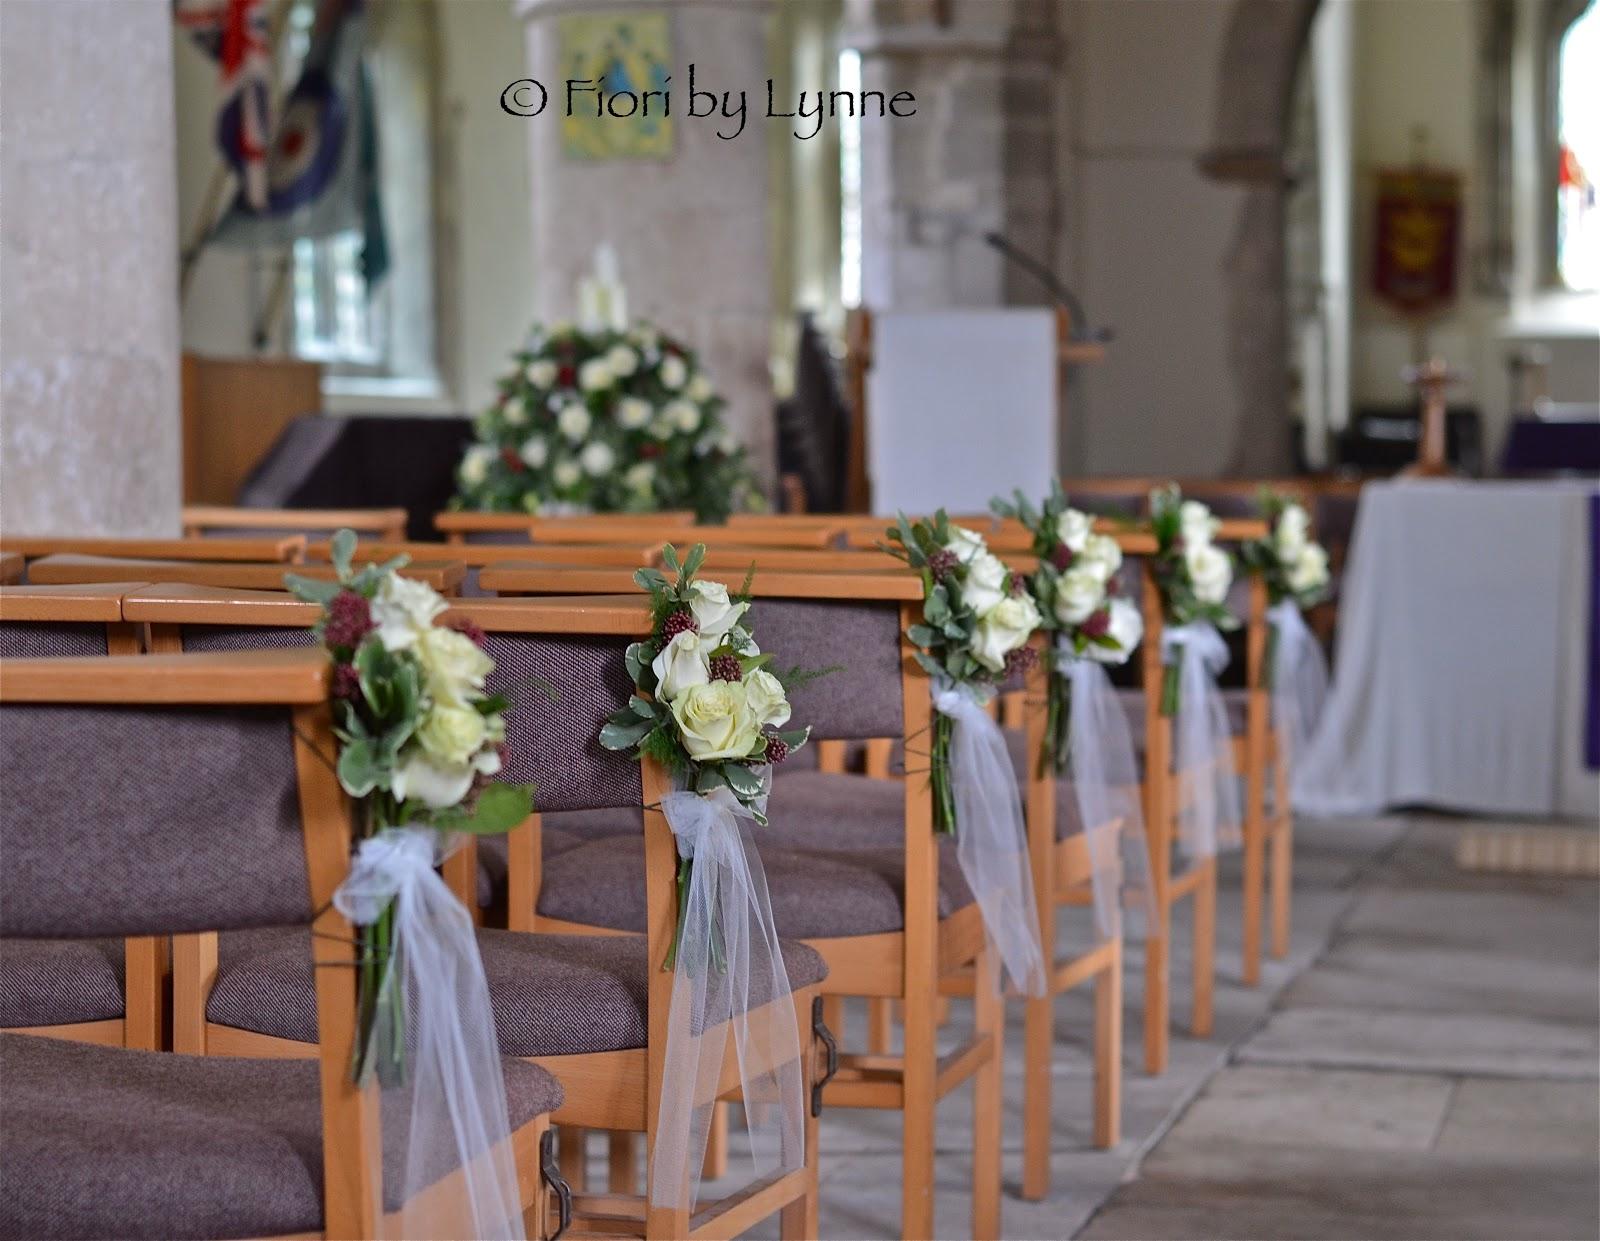 Wedding Flowers Blog: Ciara\'s Vintage Cream and Burgundy Wedding ...